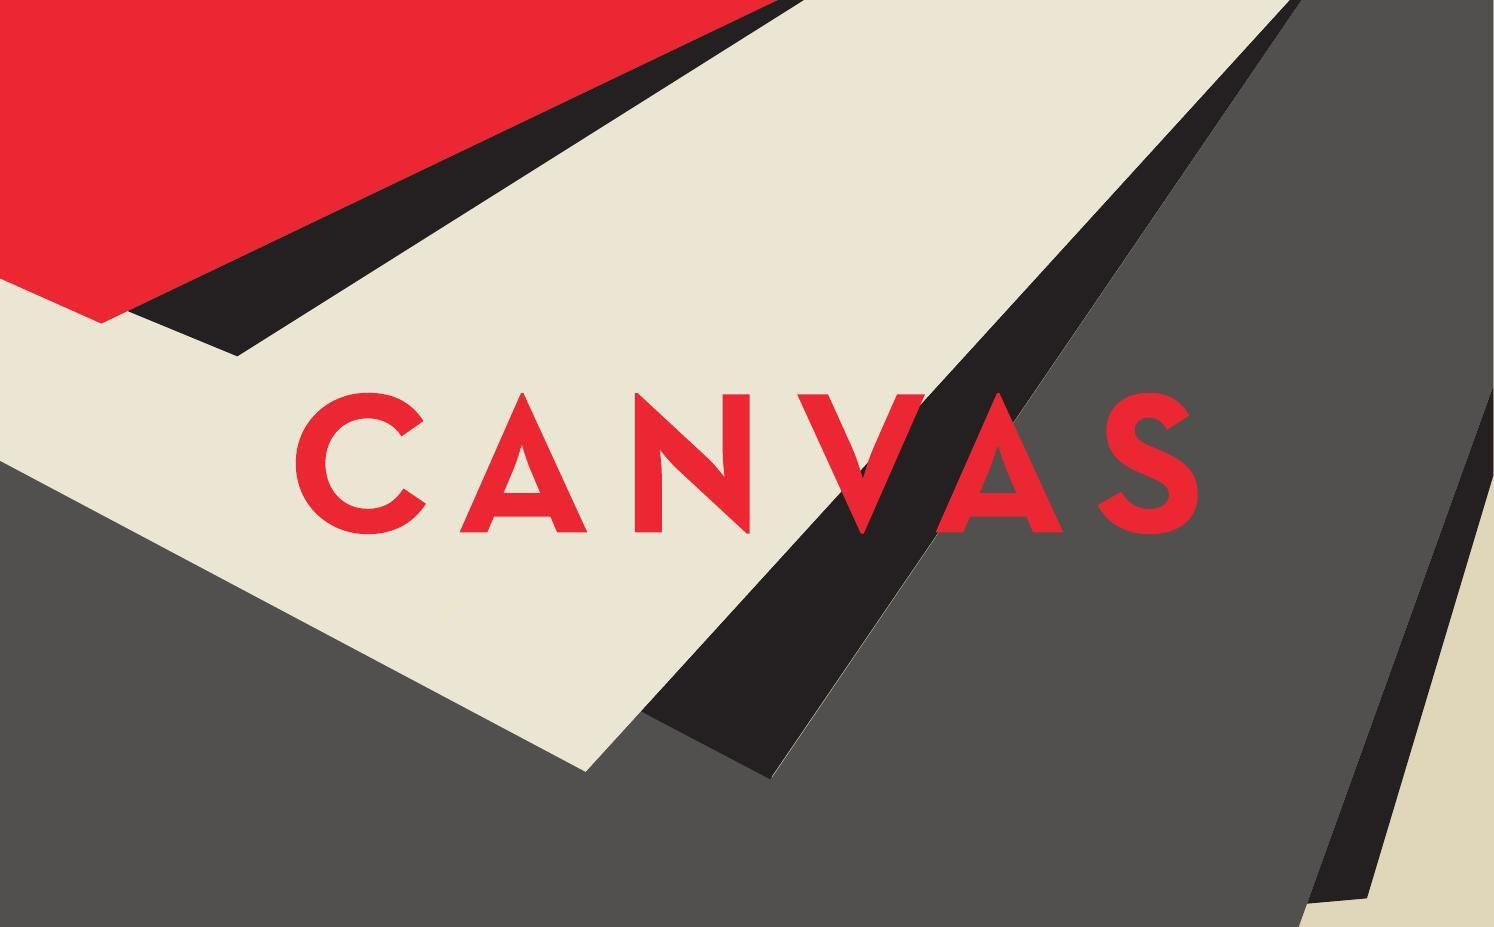 Canvas Sales Presentation  Canvases